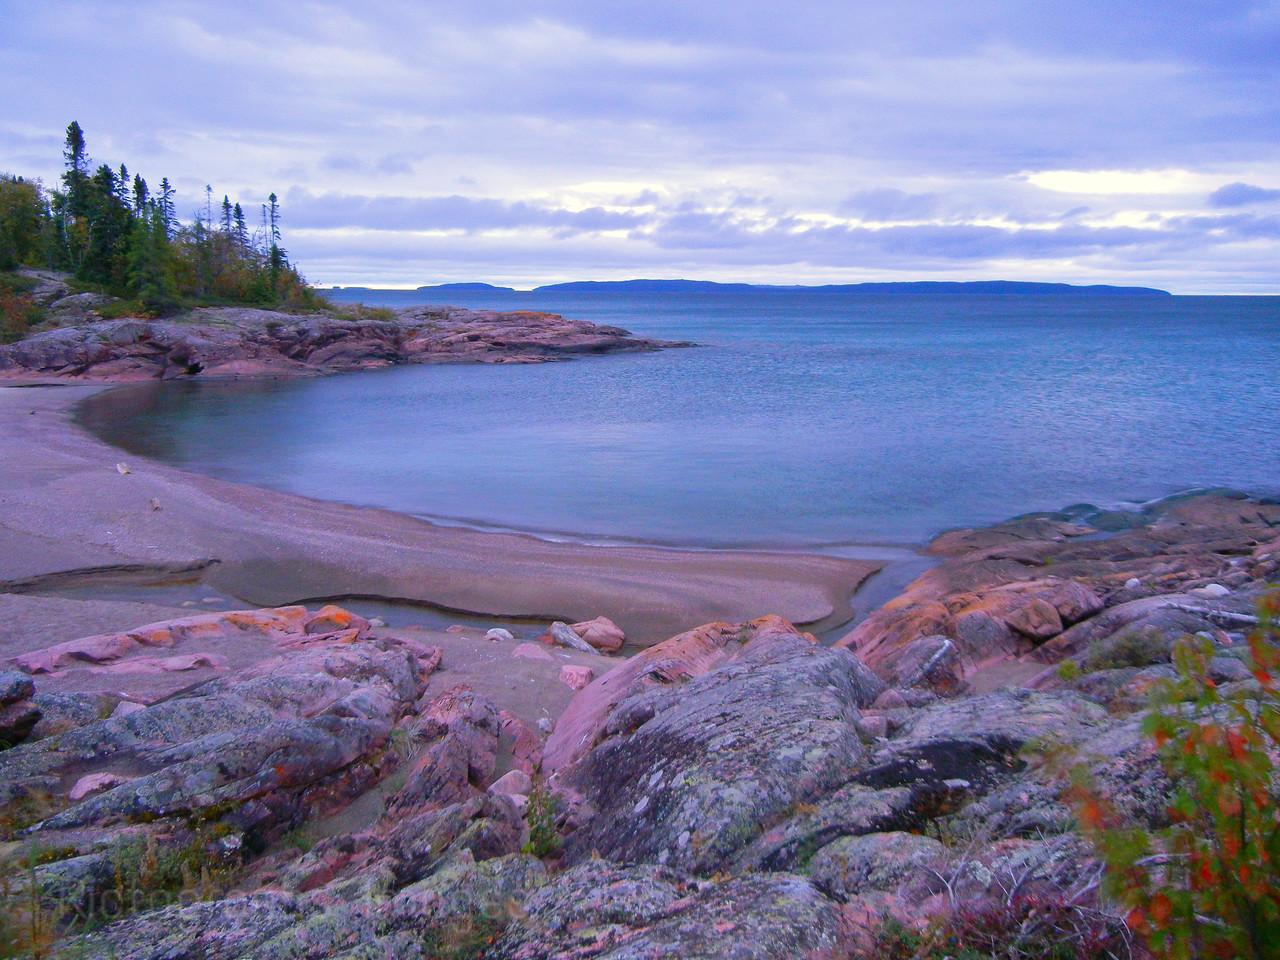 Blue Water Beach, Terrace Bay, Ontario, Canada, Lake Superior